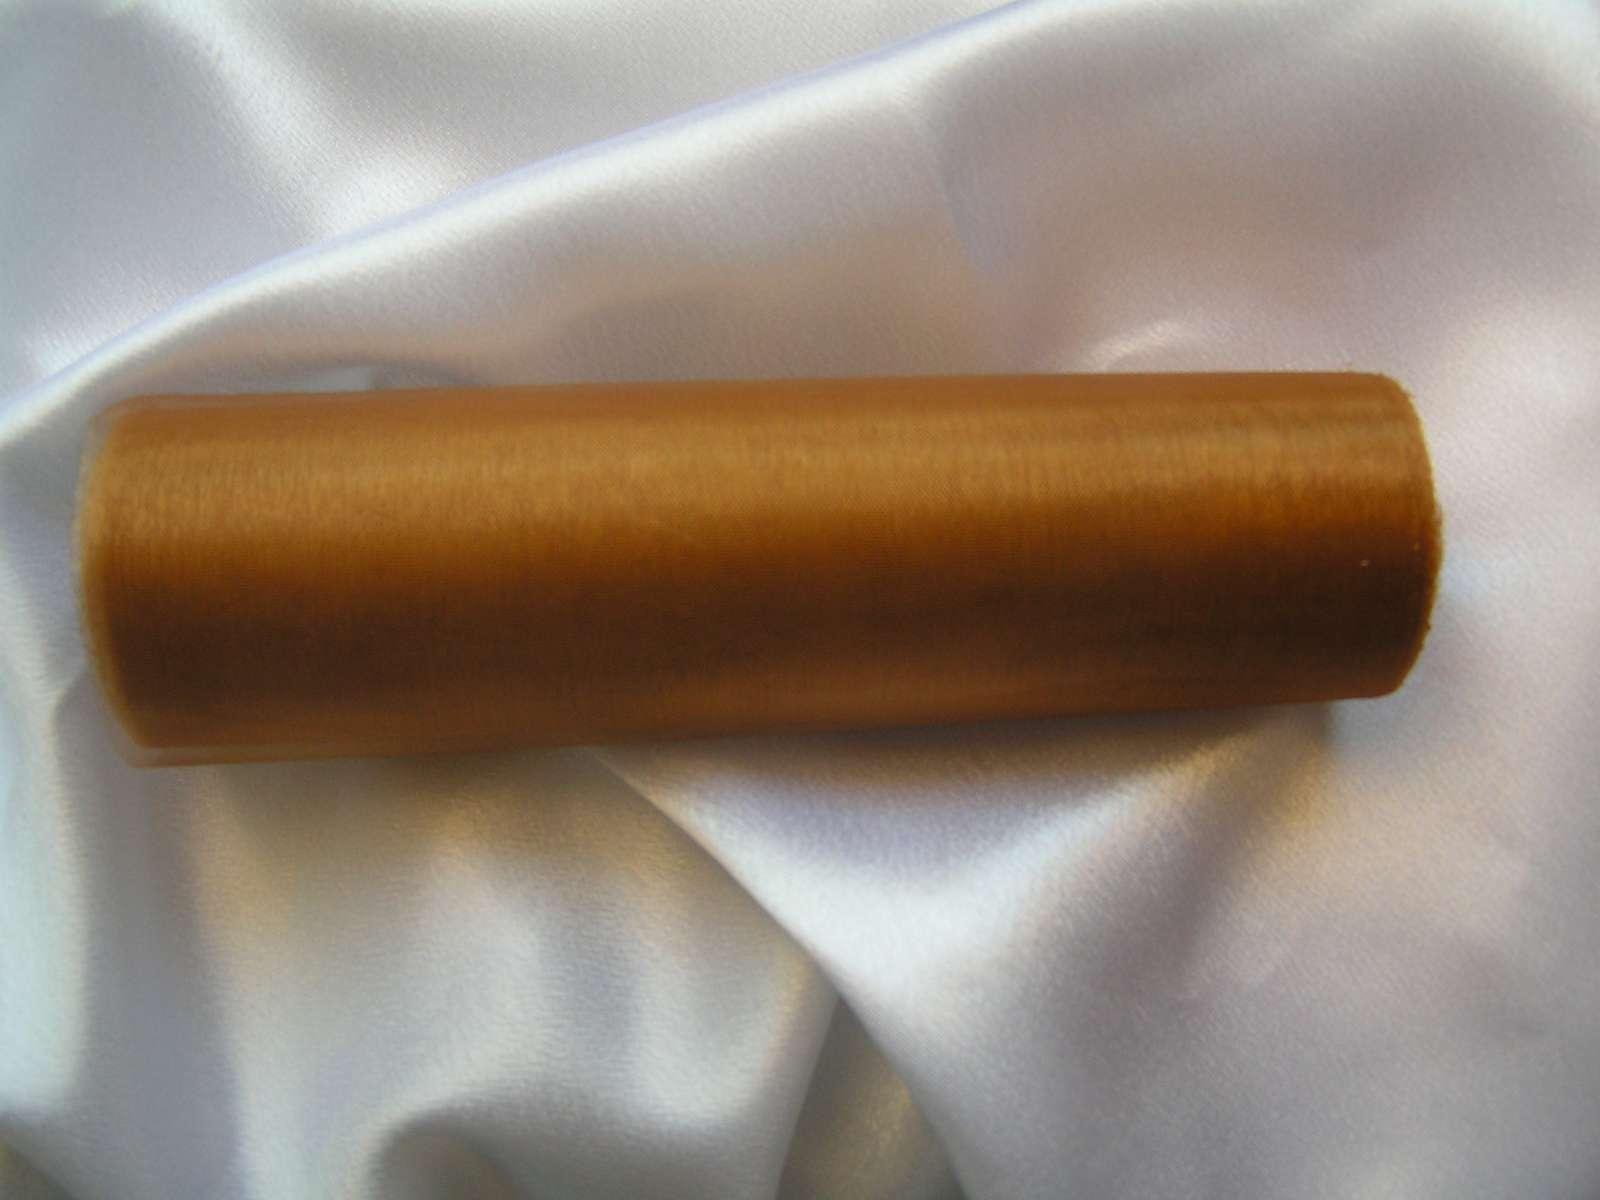 Karamelová organza 16 cm x 9 m - Obrázek č. 1